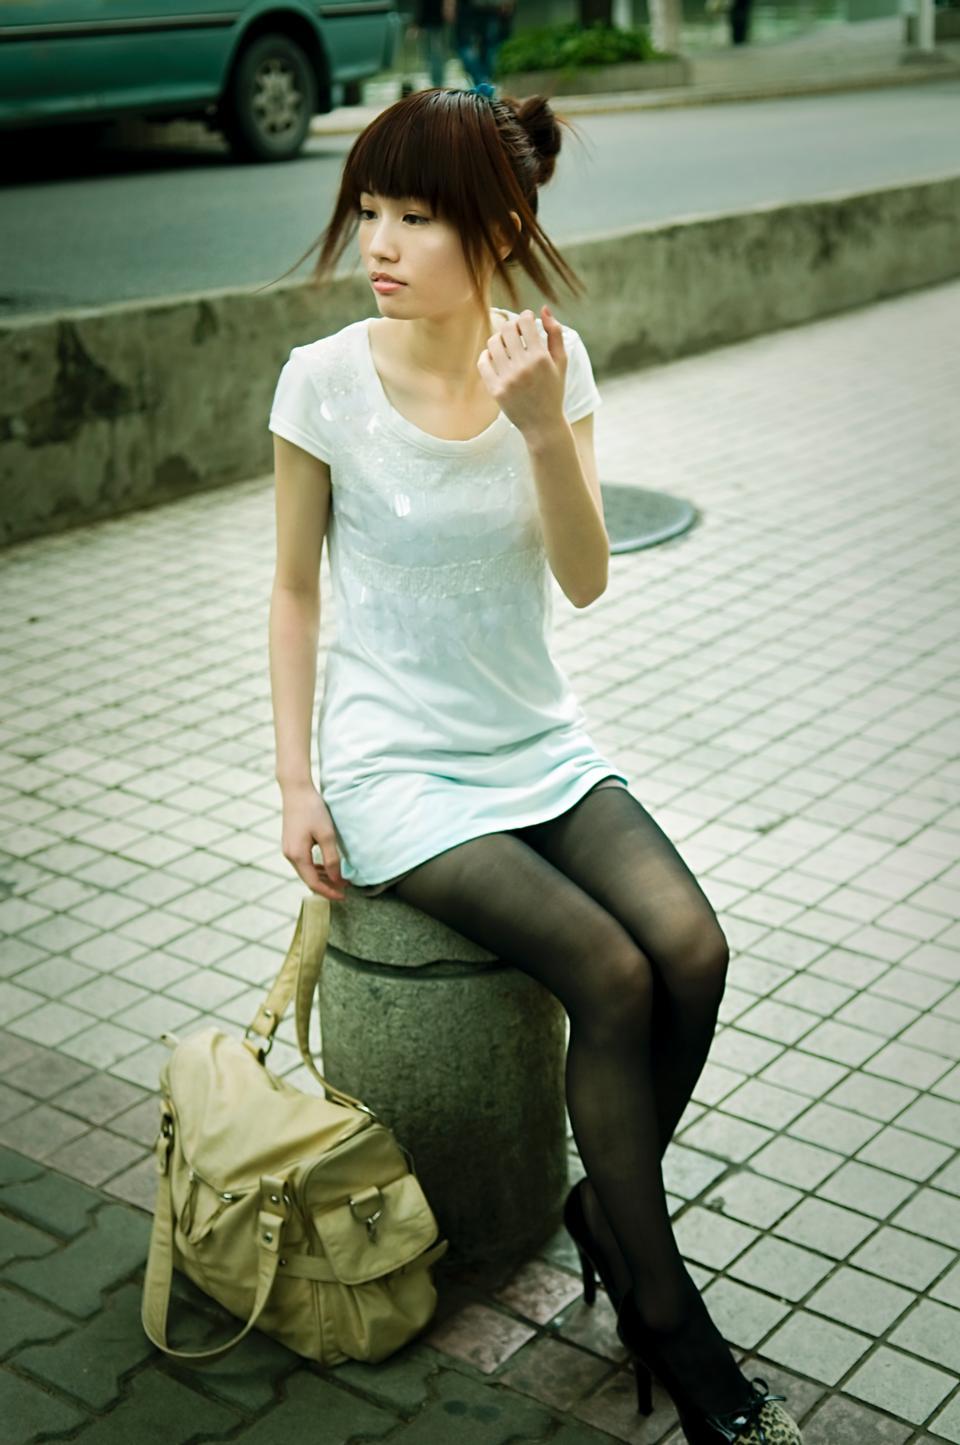 Free A Beautiful Asian Lady Posing Outdoors